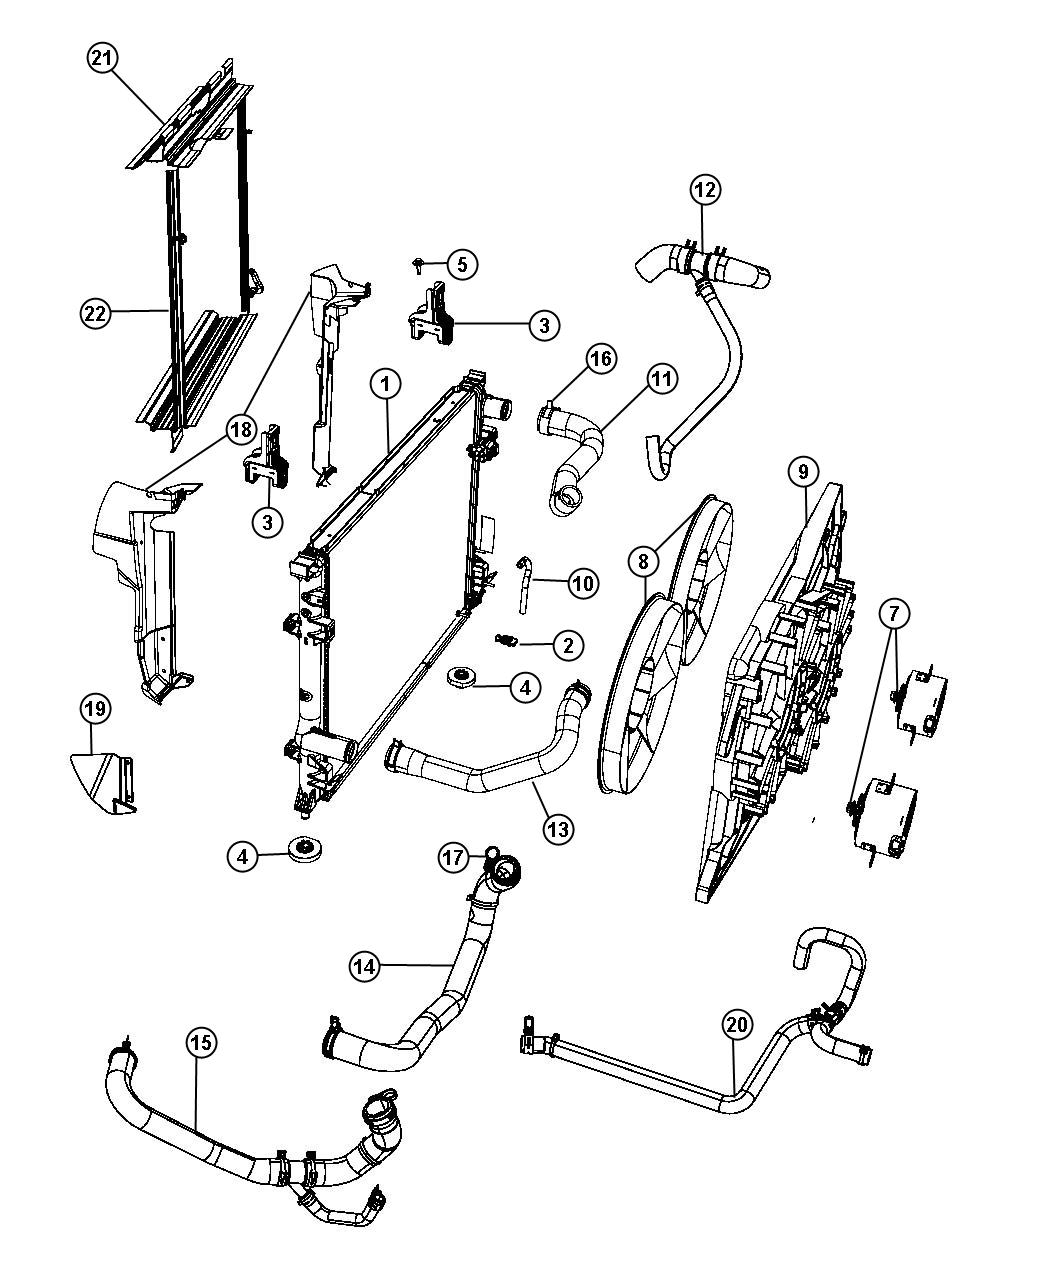 tags: #schematic of dodge hemi#dodge 2007 ram 2500 5#dodge durango 4#2006 dodge  charger 5 7 hemi engine diagram#dodge ram 5 7 motor diagram#4#belt diagram